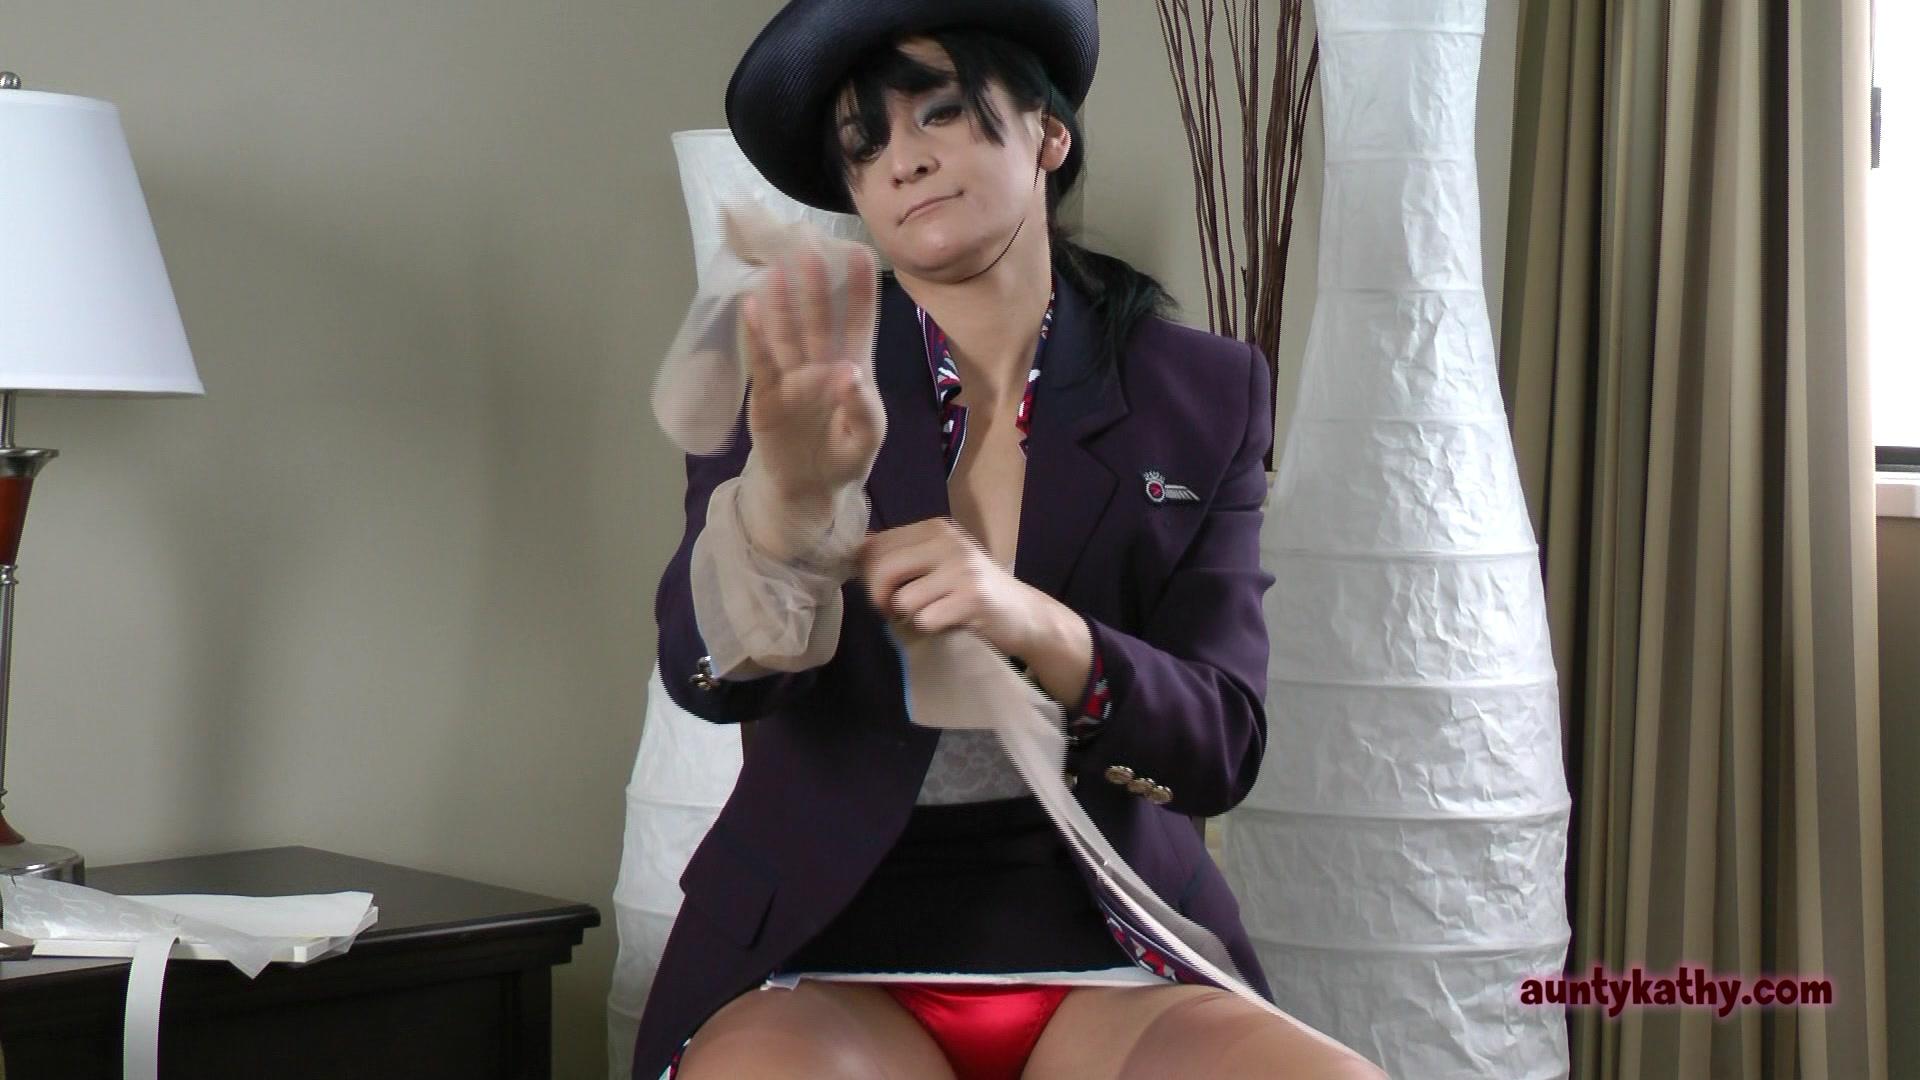 Milf stewardess in stockings